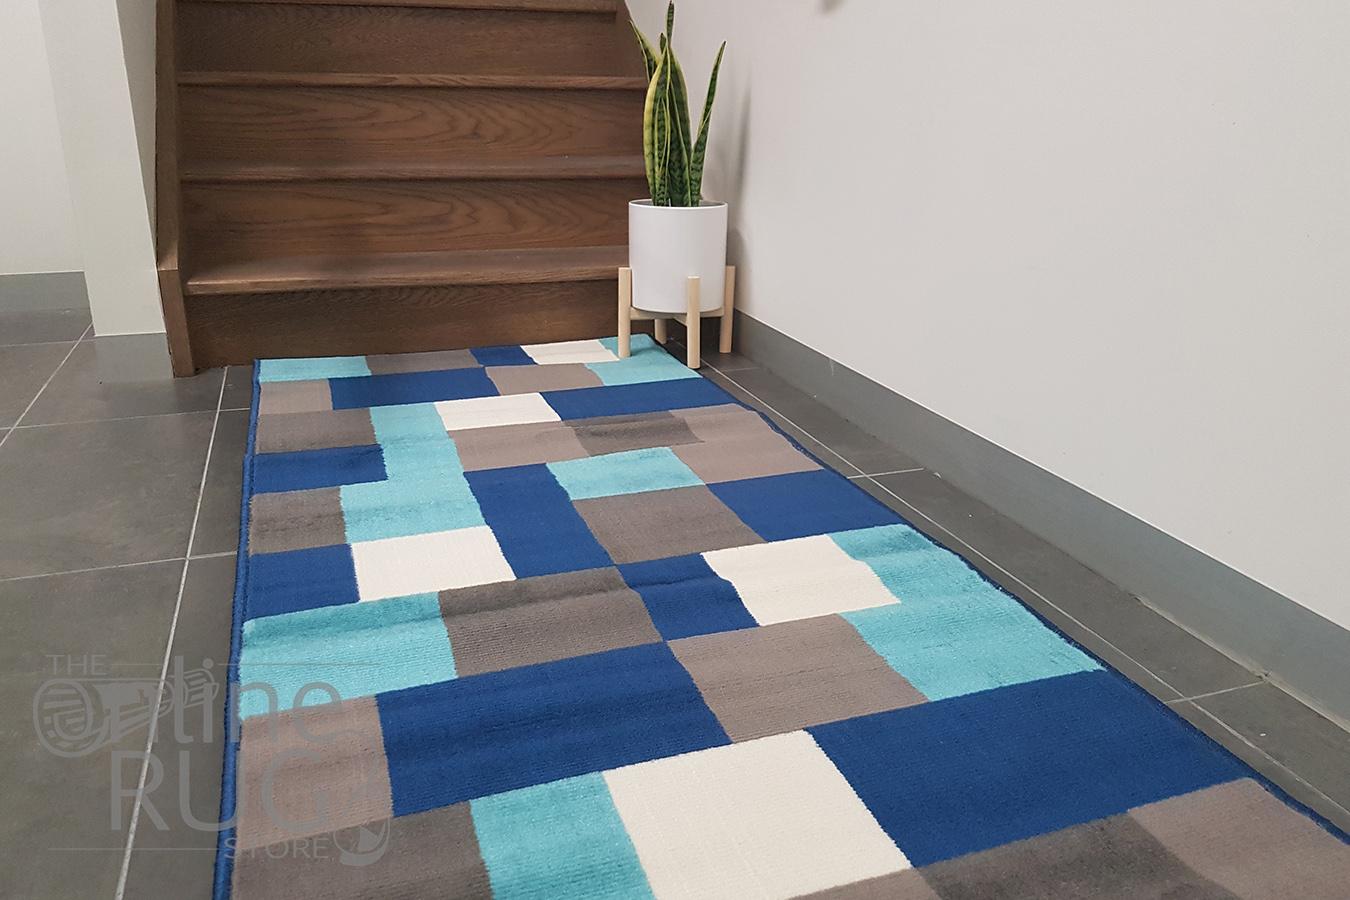 Industry Multicolour Tiles Hallway Runner